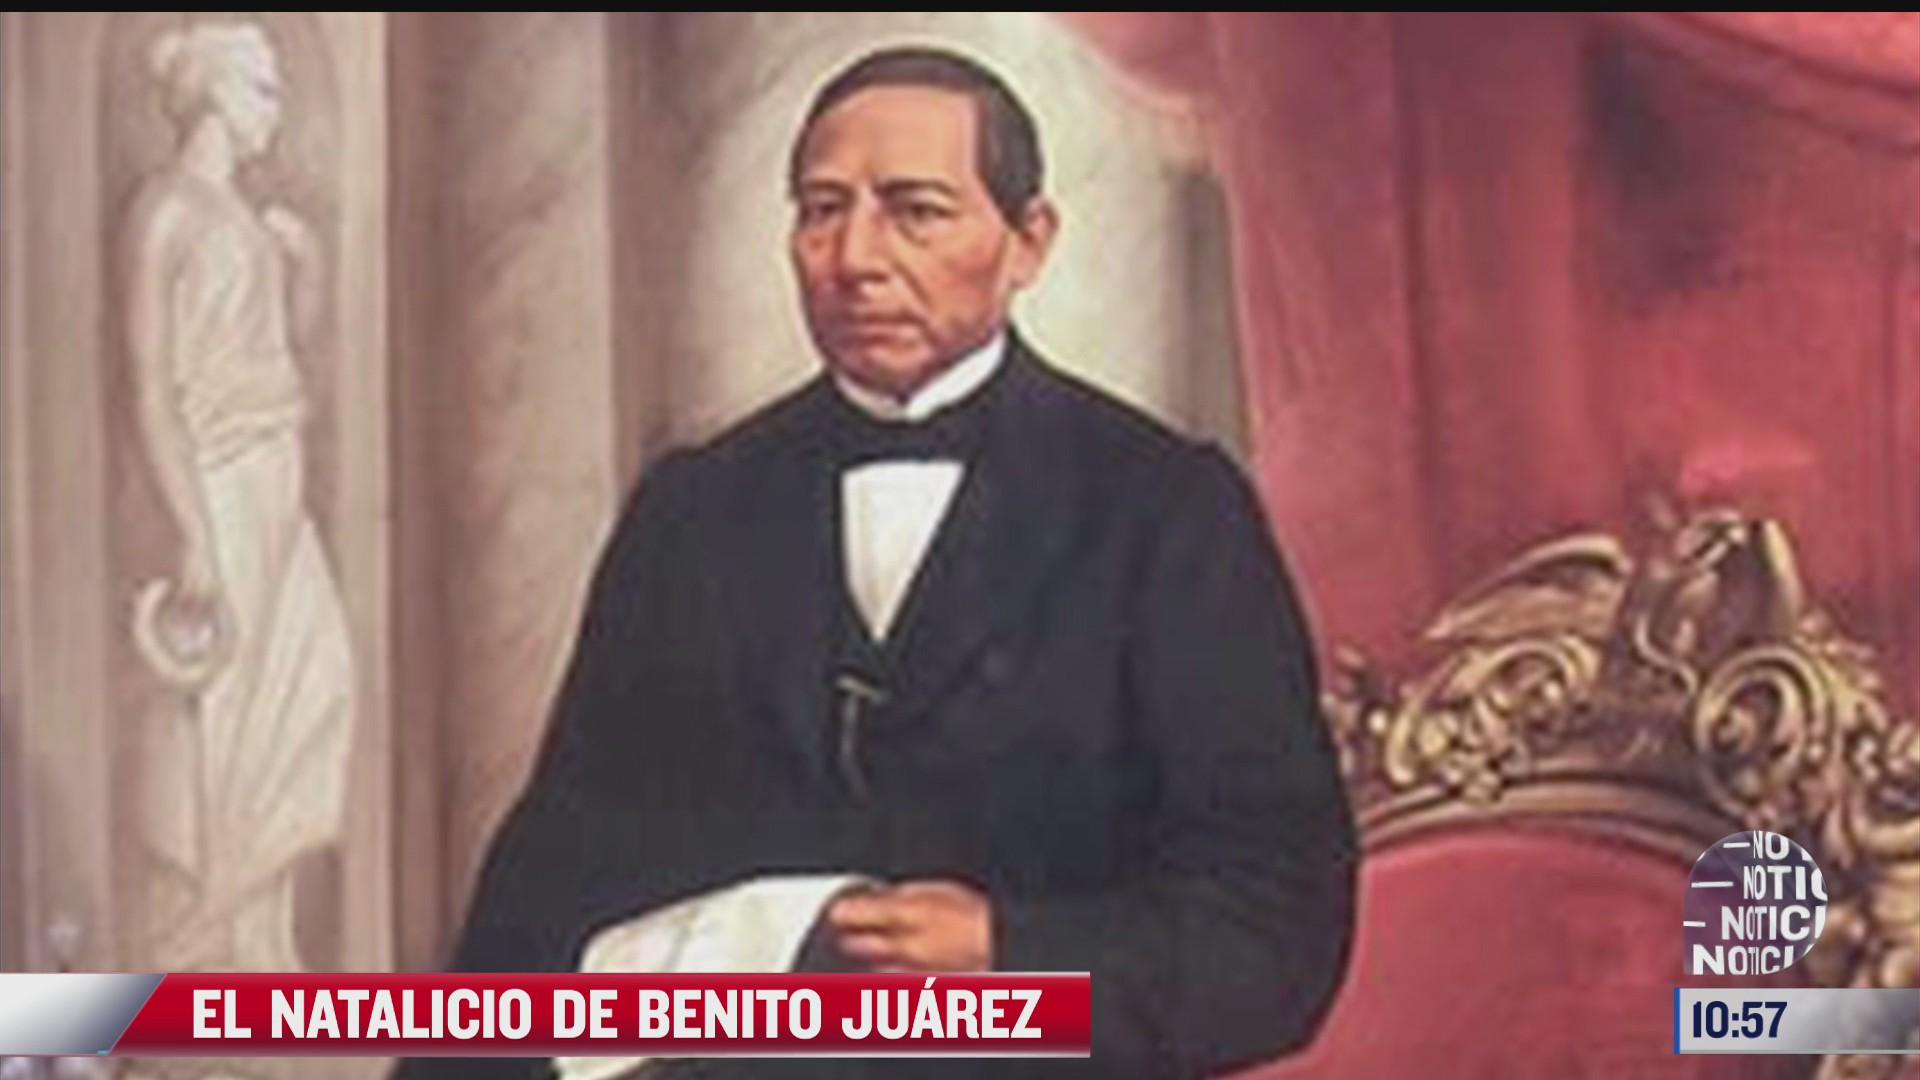 215 aniversario del natalicio de benito juarez